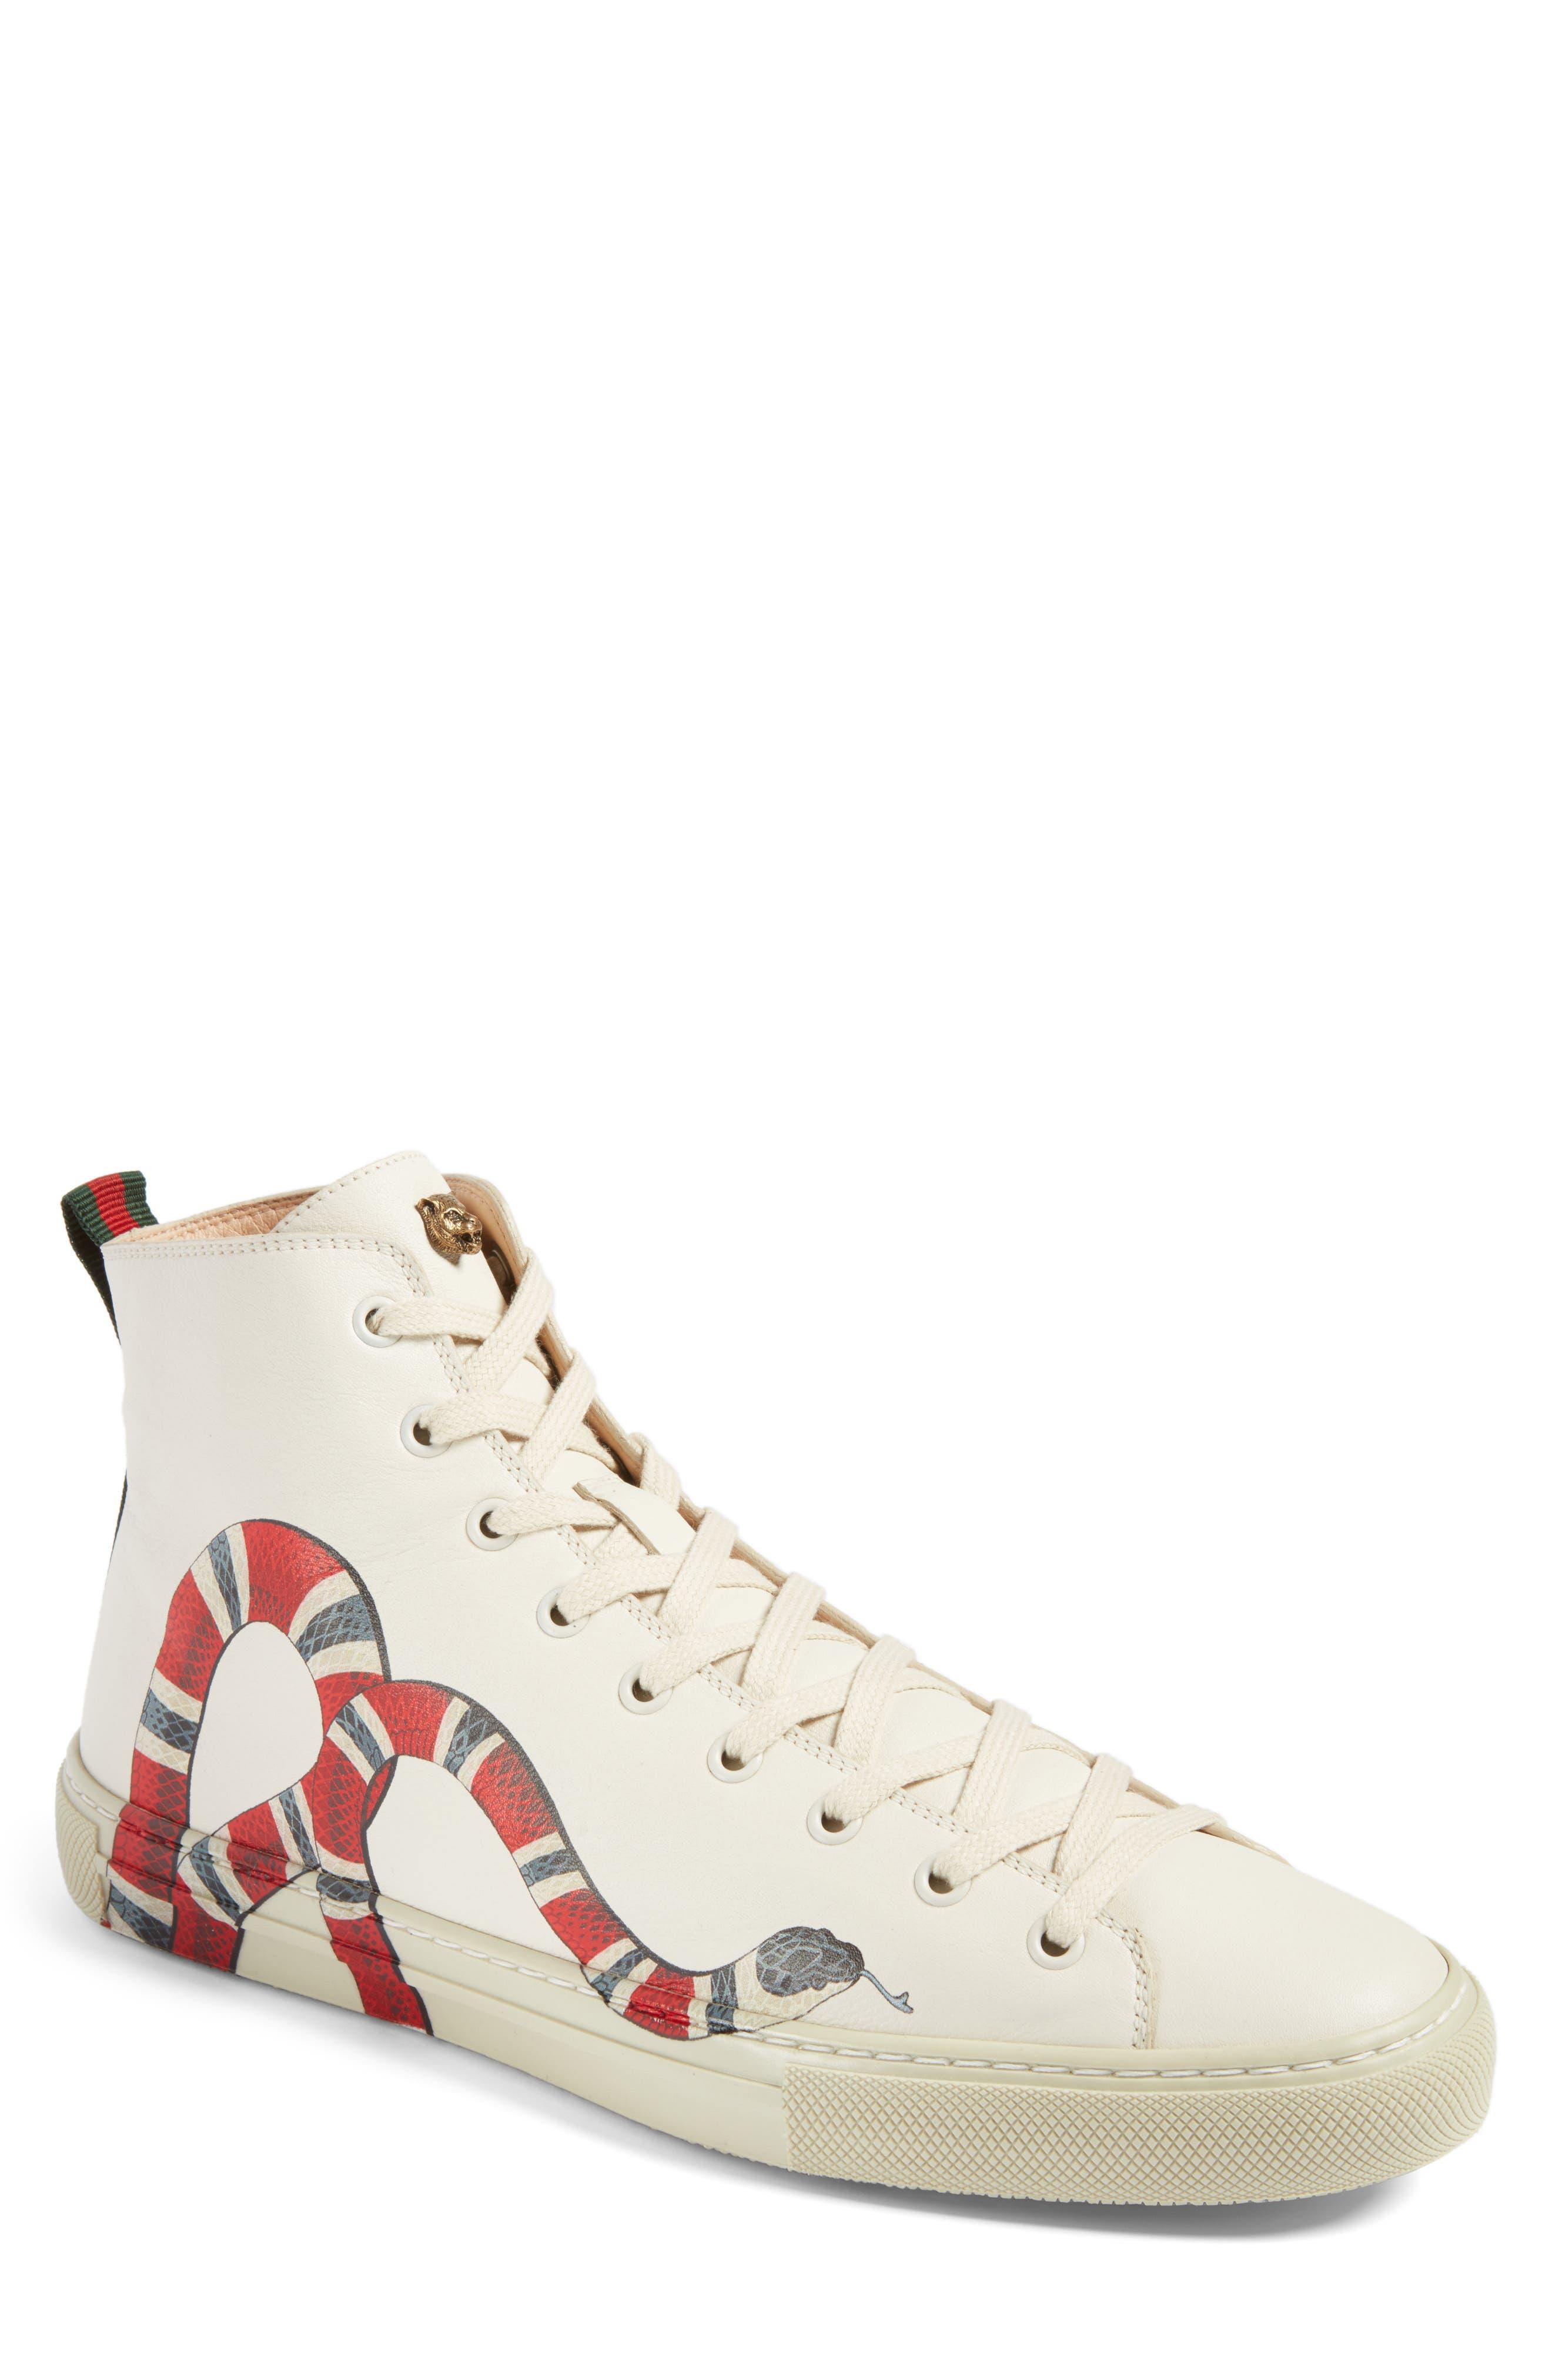 GUCCI Major High Top Sneaker